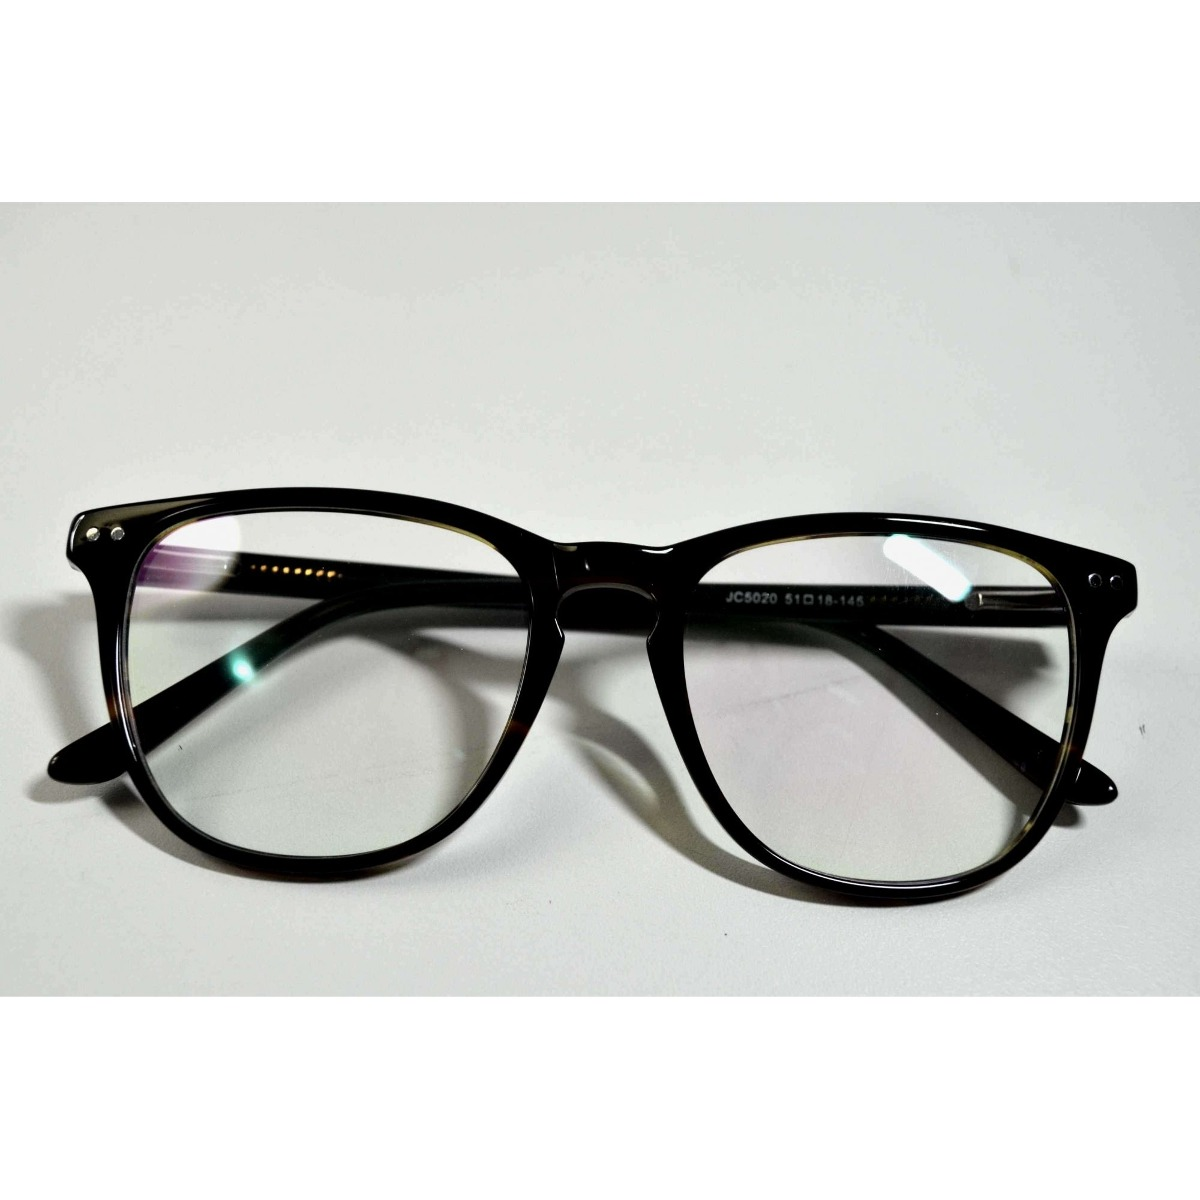 85b607036 armação óculos grau feminino estilo selena tartaruga. Carregando zoom.